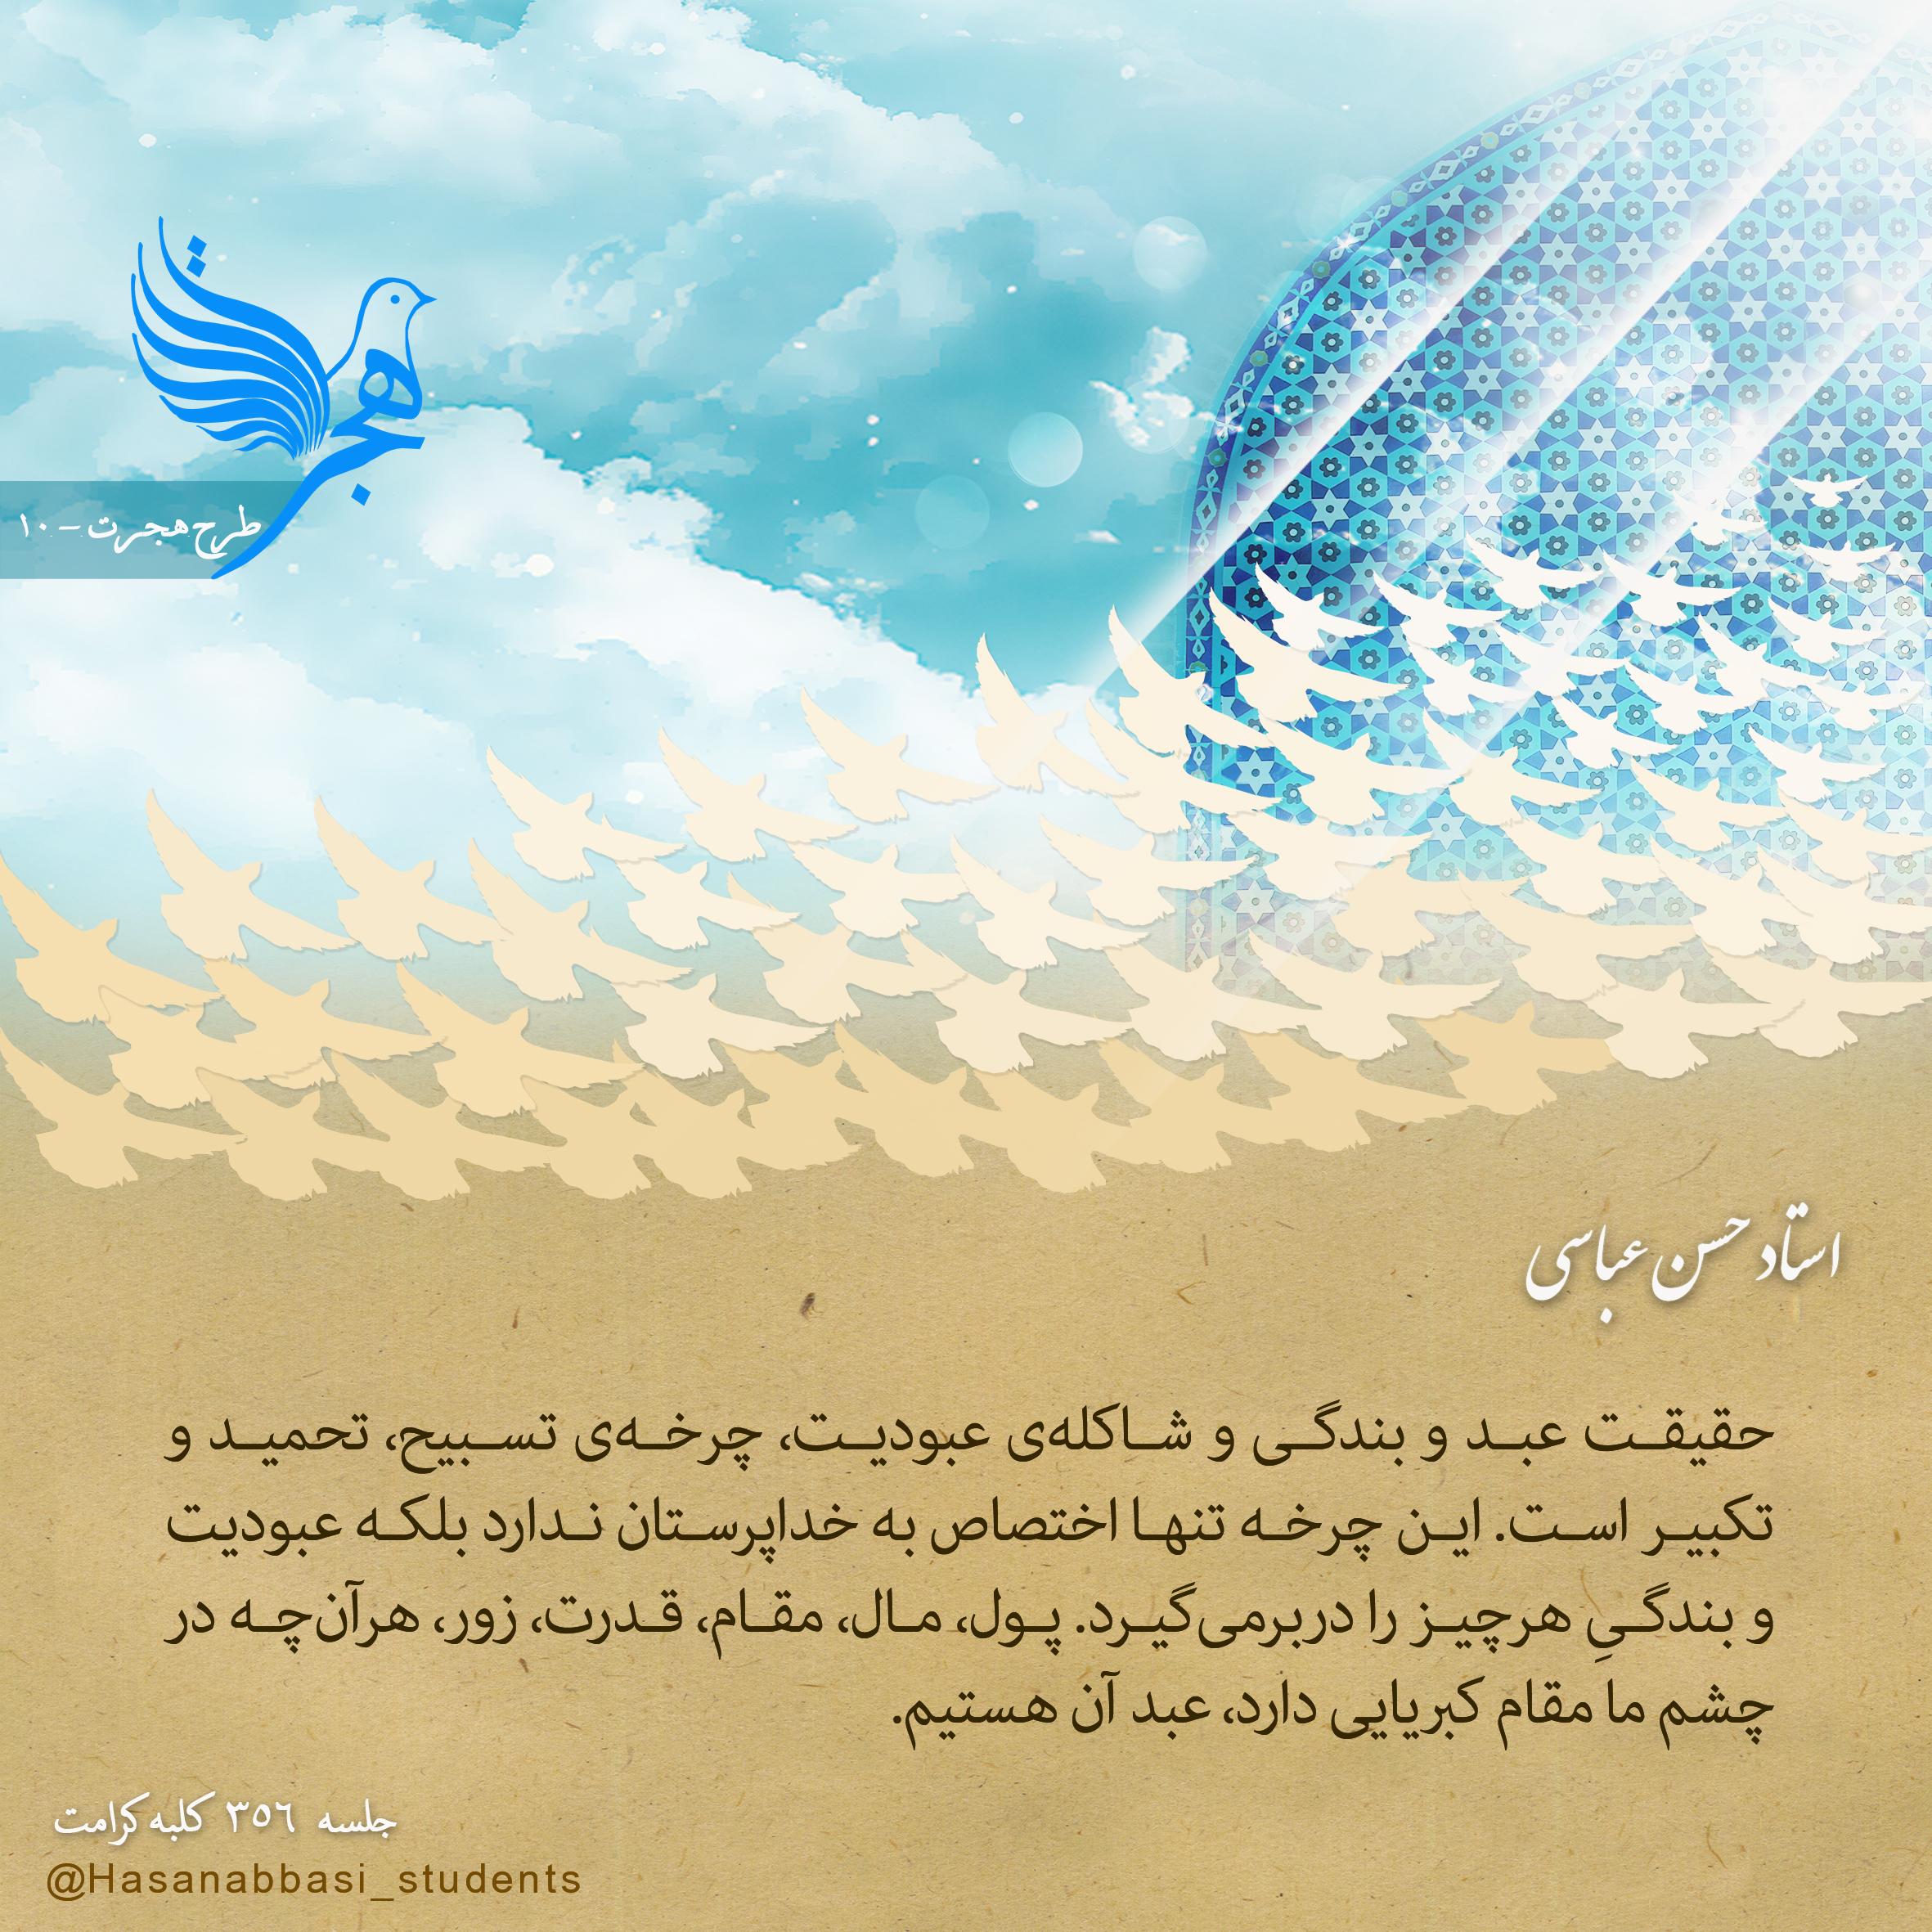 طرح هجرت 10 - «وَ ما خَلَقْتُ الْجِنَّ وَ الْإِنْسَ إِلاَّ لِیَعْبُدُونِ»